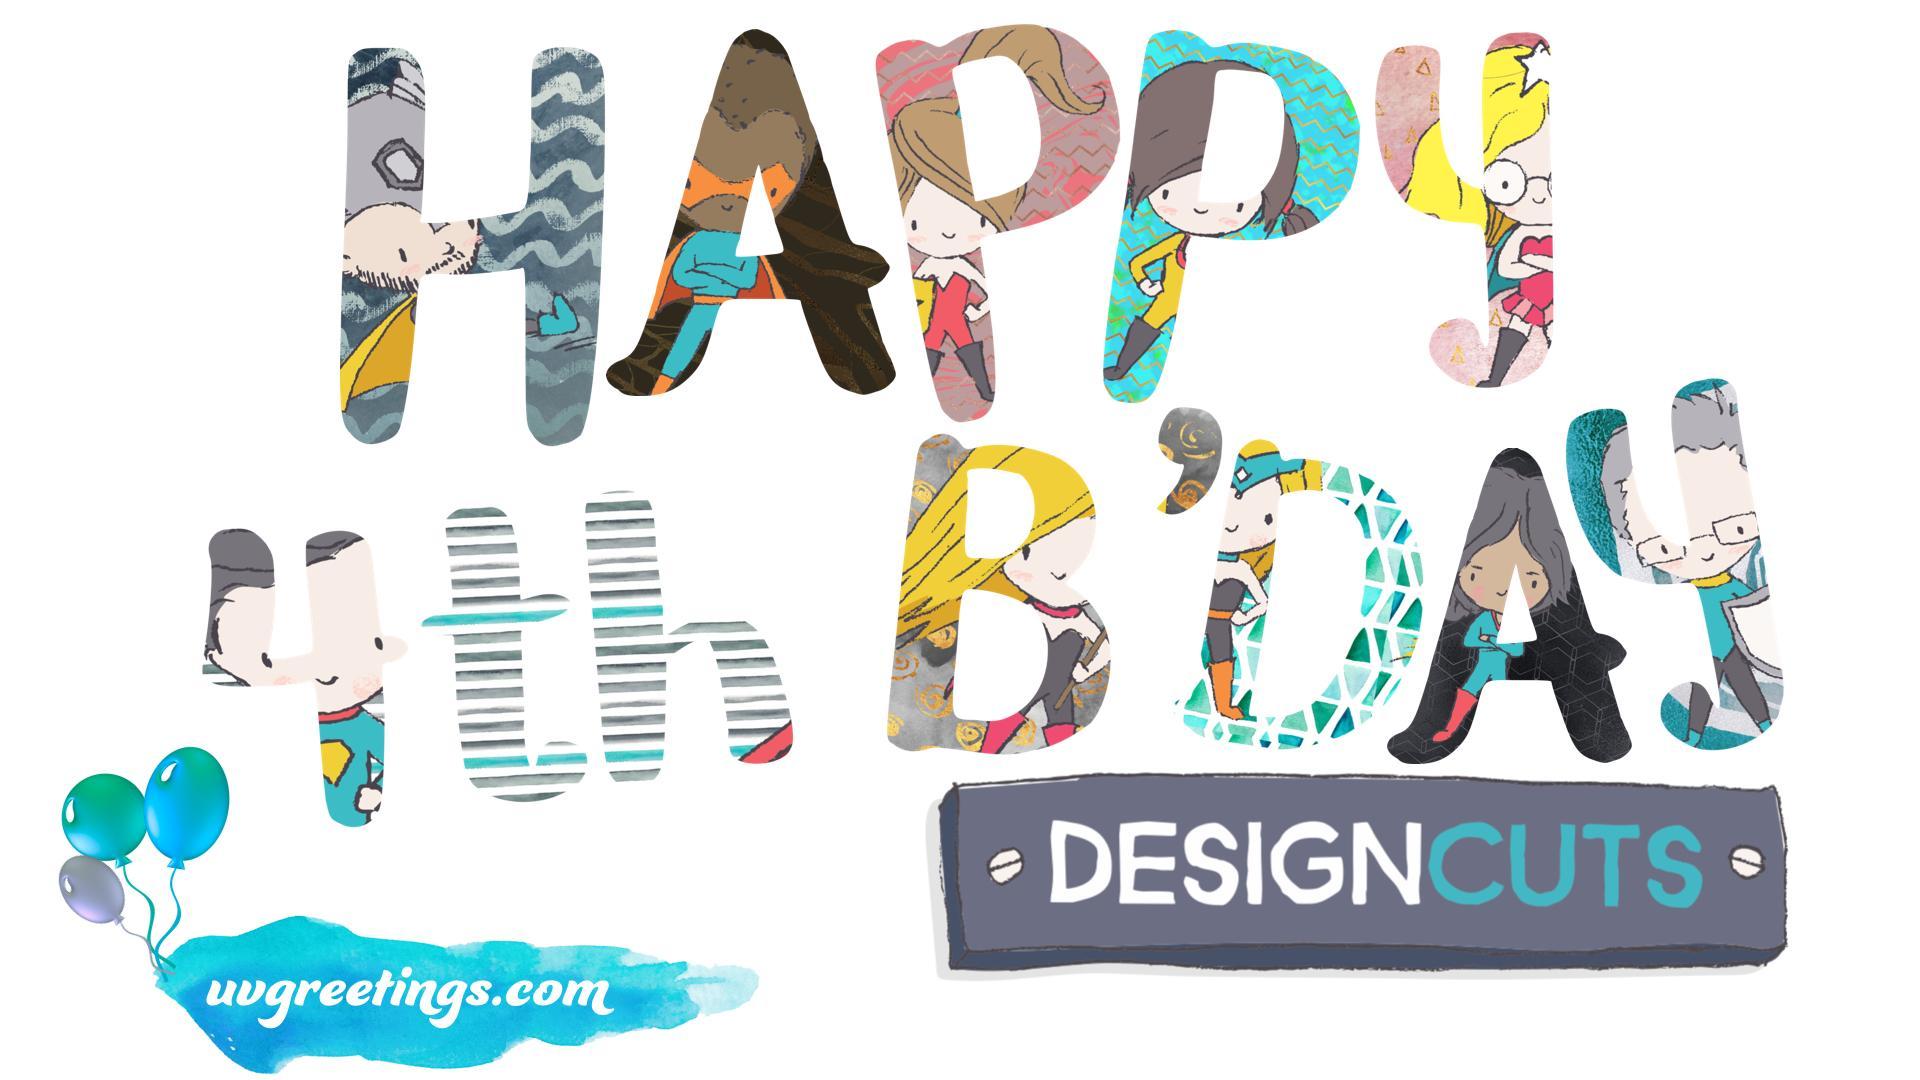 Birthday Greeting - Design Cuts 4th Anniversary